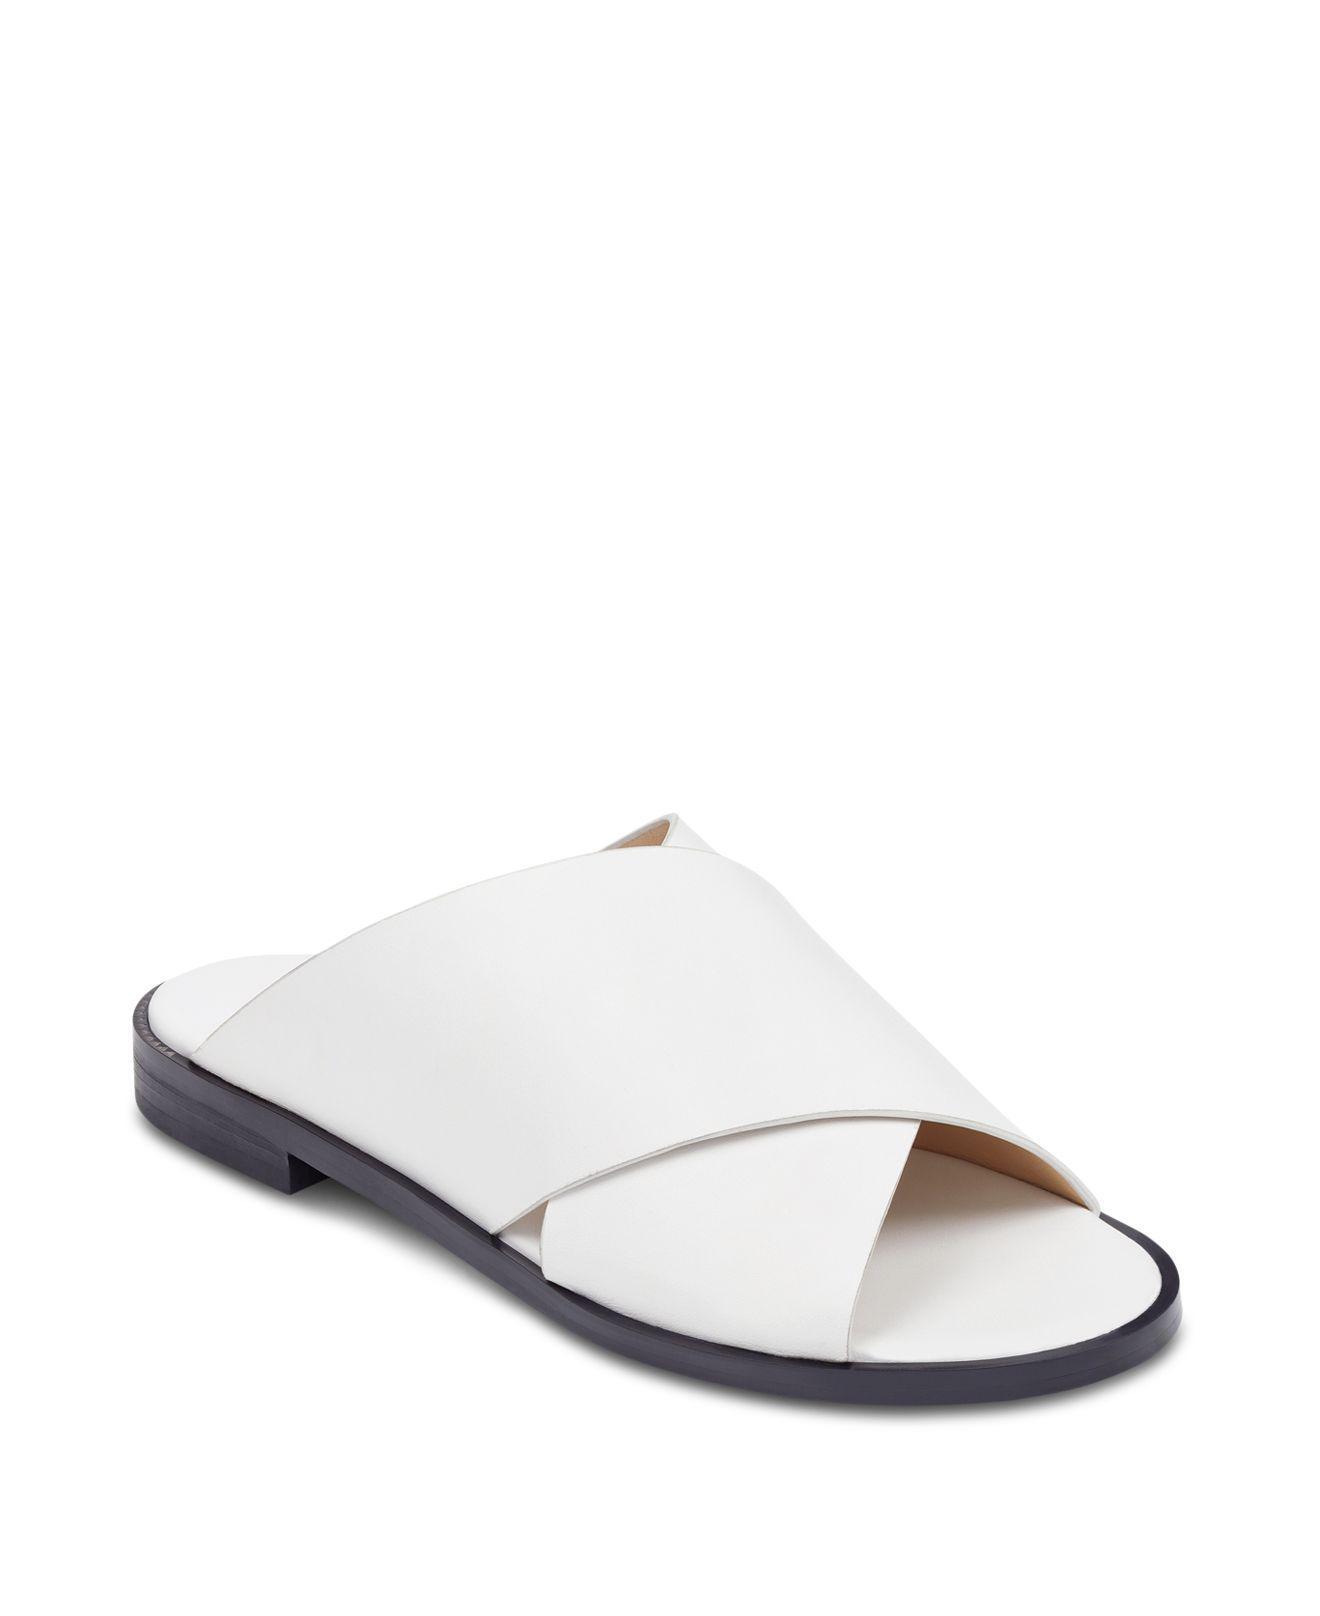 MARC FISHER Idinia Leather Slide Sandals Vy2n2N5iGJ